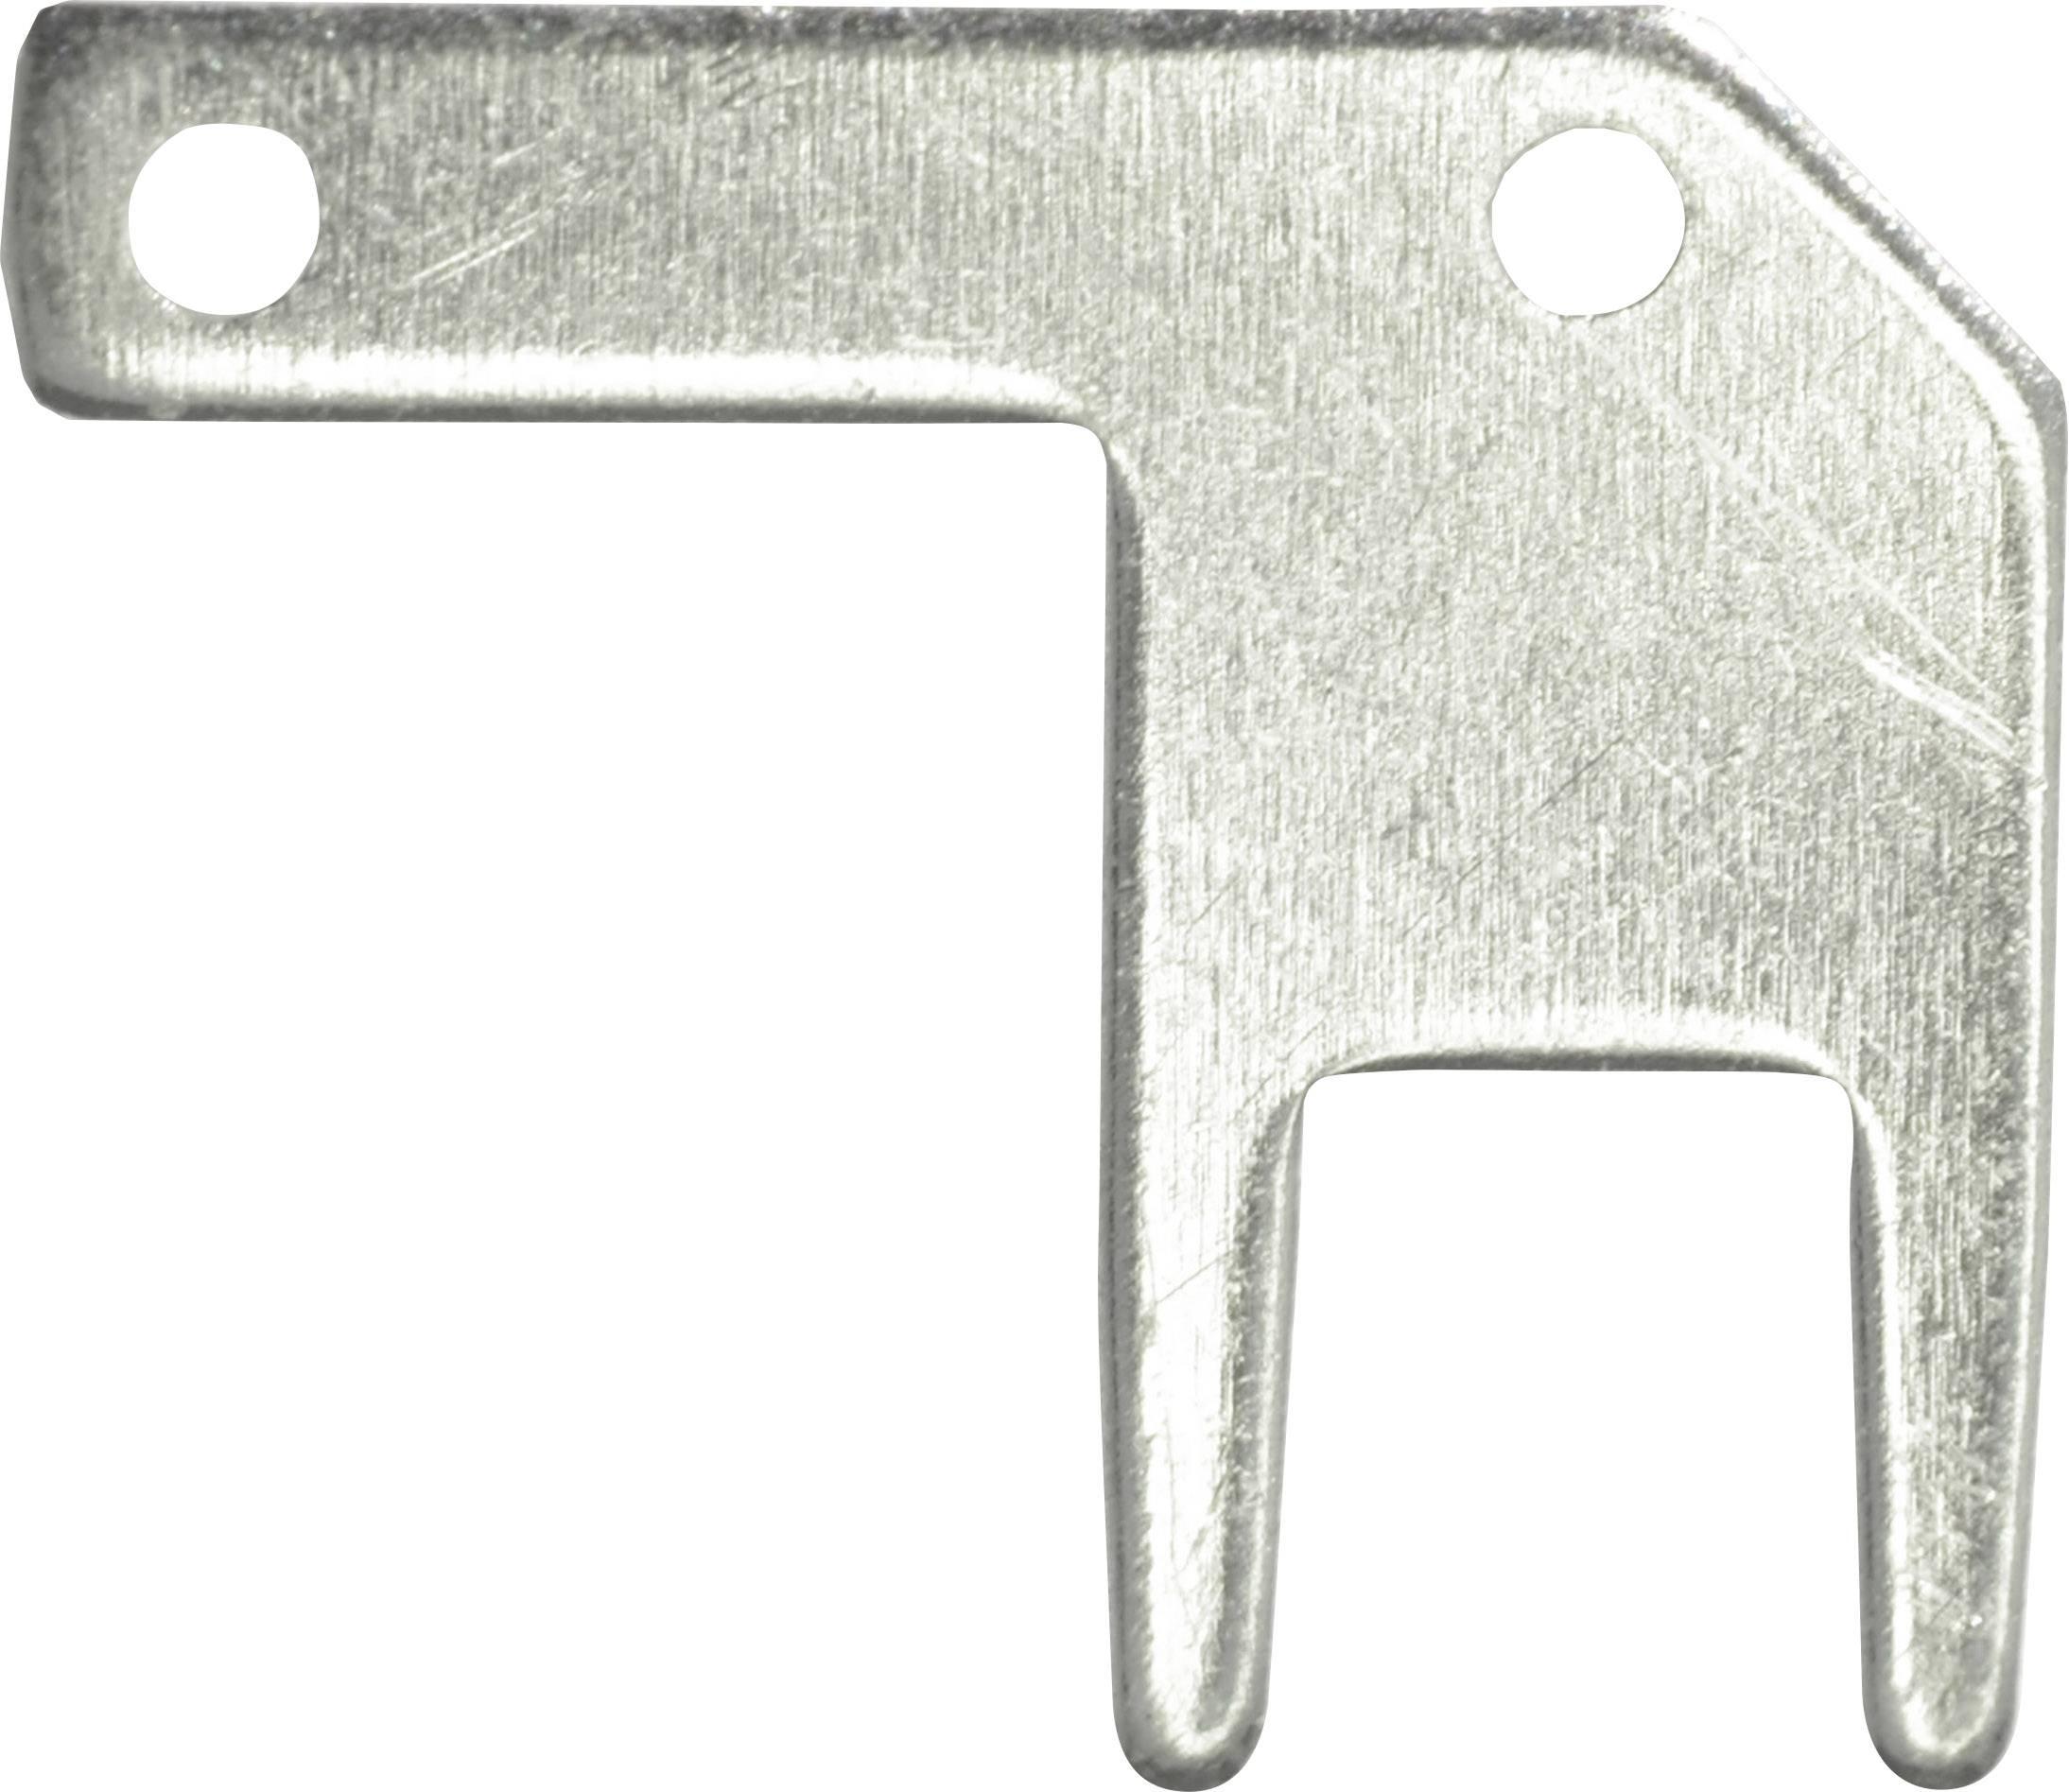 Faston zástrčka Vogt Verbindungstechnik 378705.68 2.8 mm x 0.5 mm, 90 °, bez izolace, kov, 100 ks